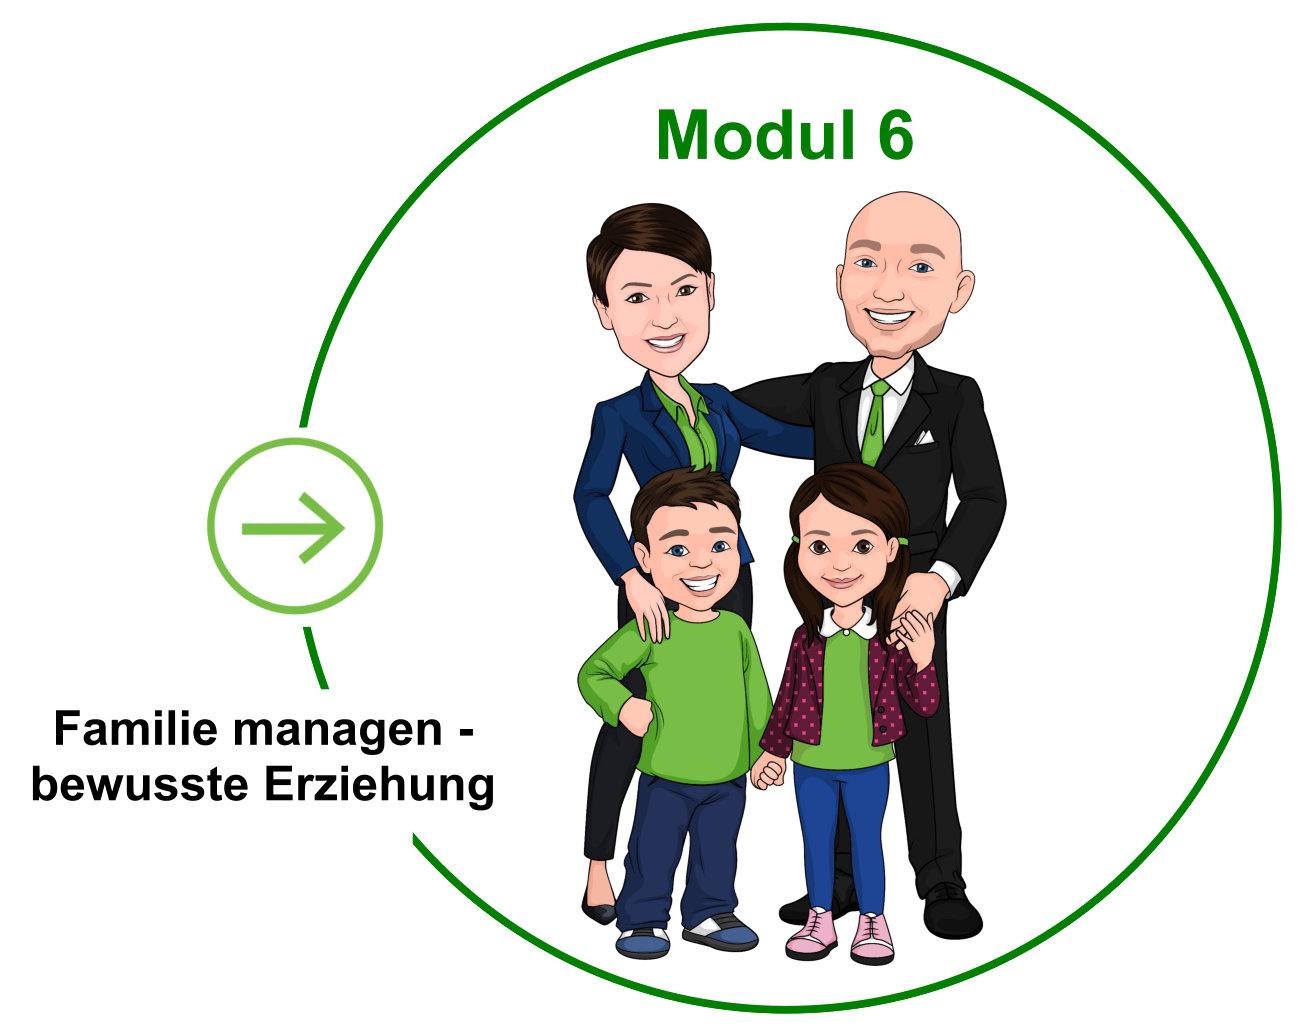 Modul 6 - Familie managen